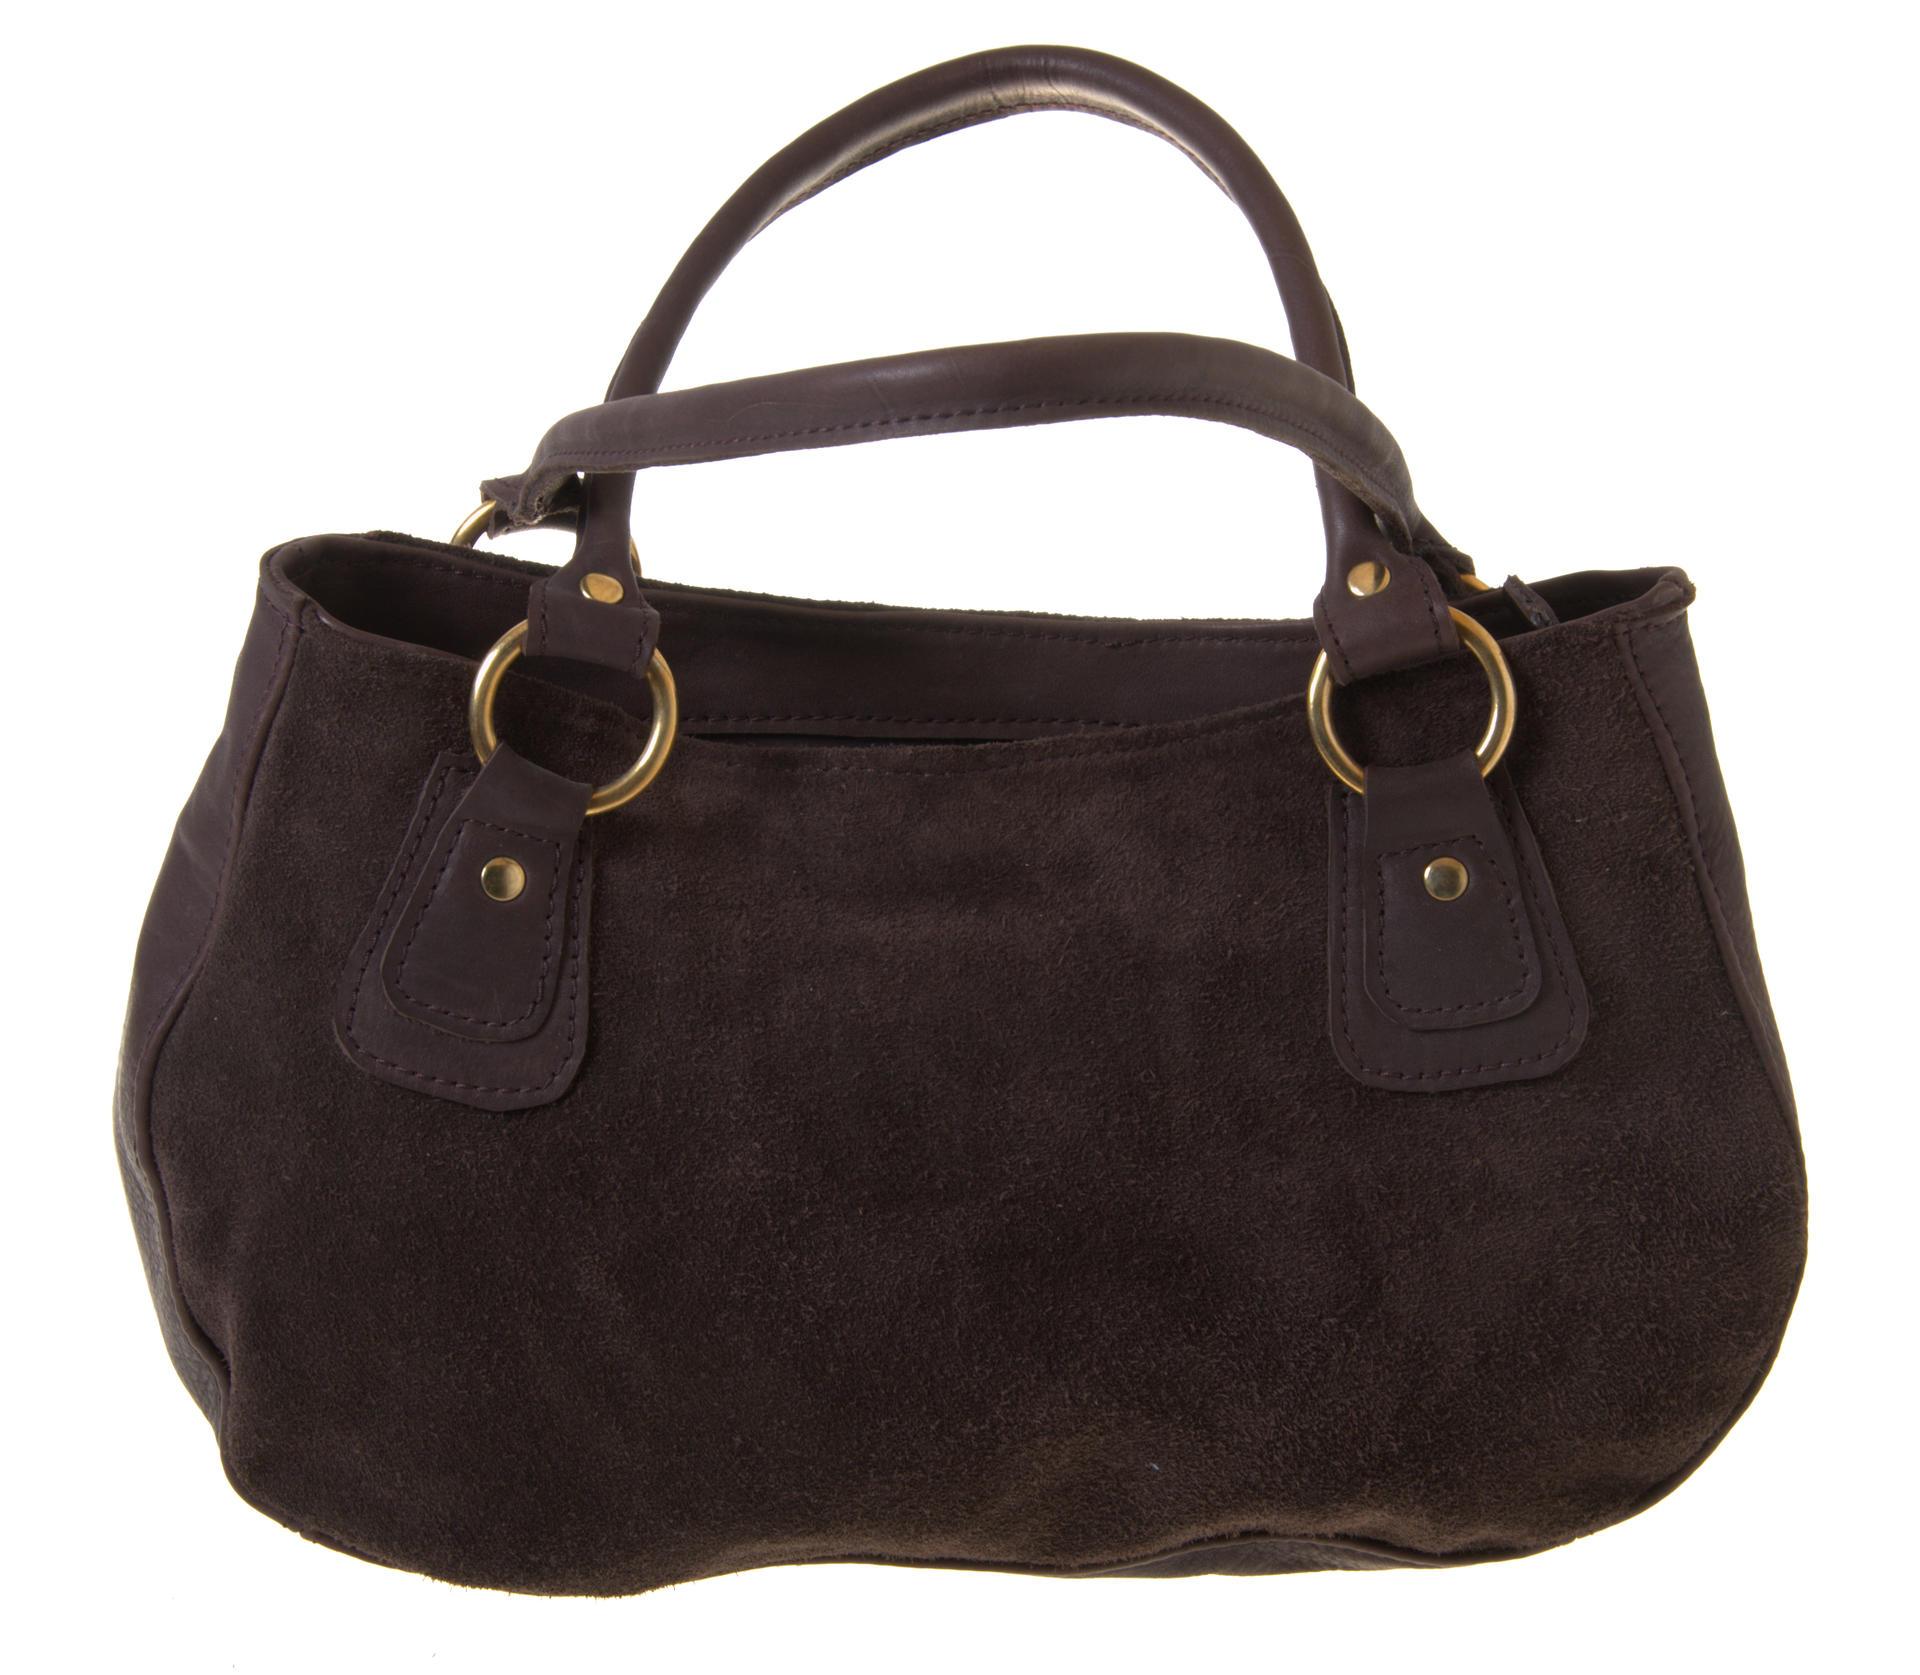 fida zipper closed bag in chocolate leather and suede